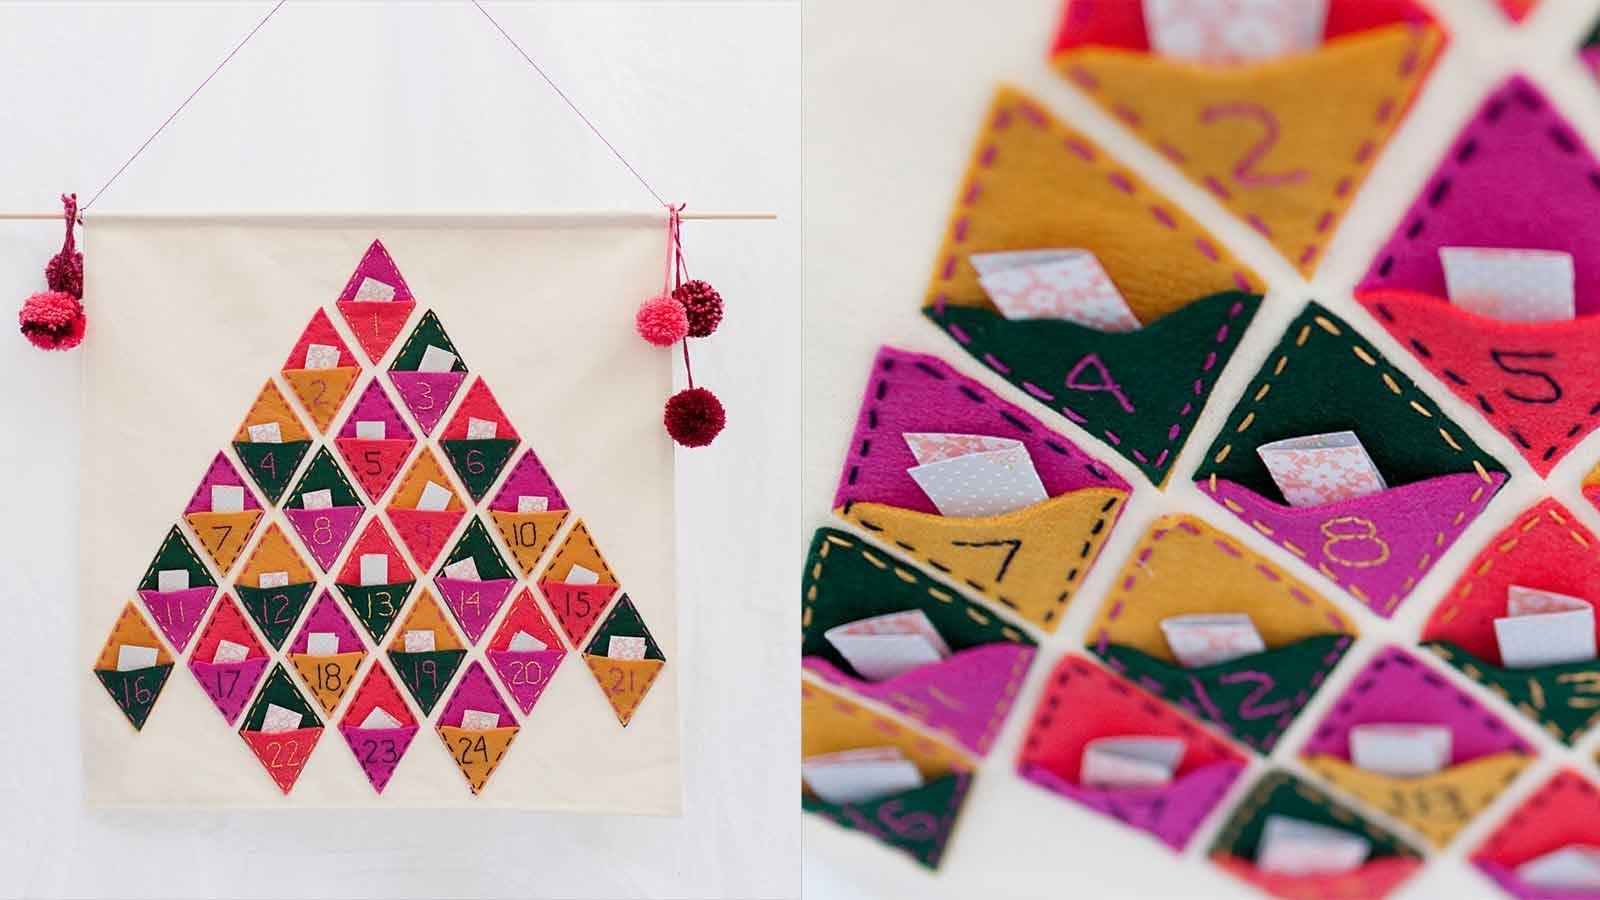 a colorful DIY felt advent calendar in the shape of a pine tree